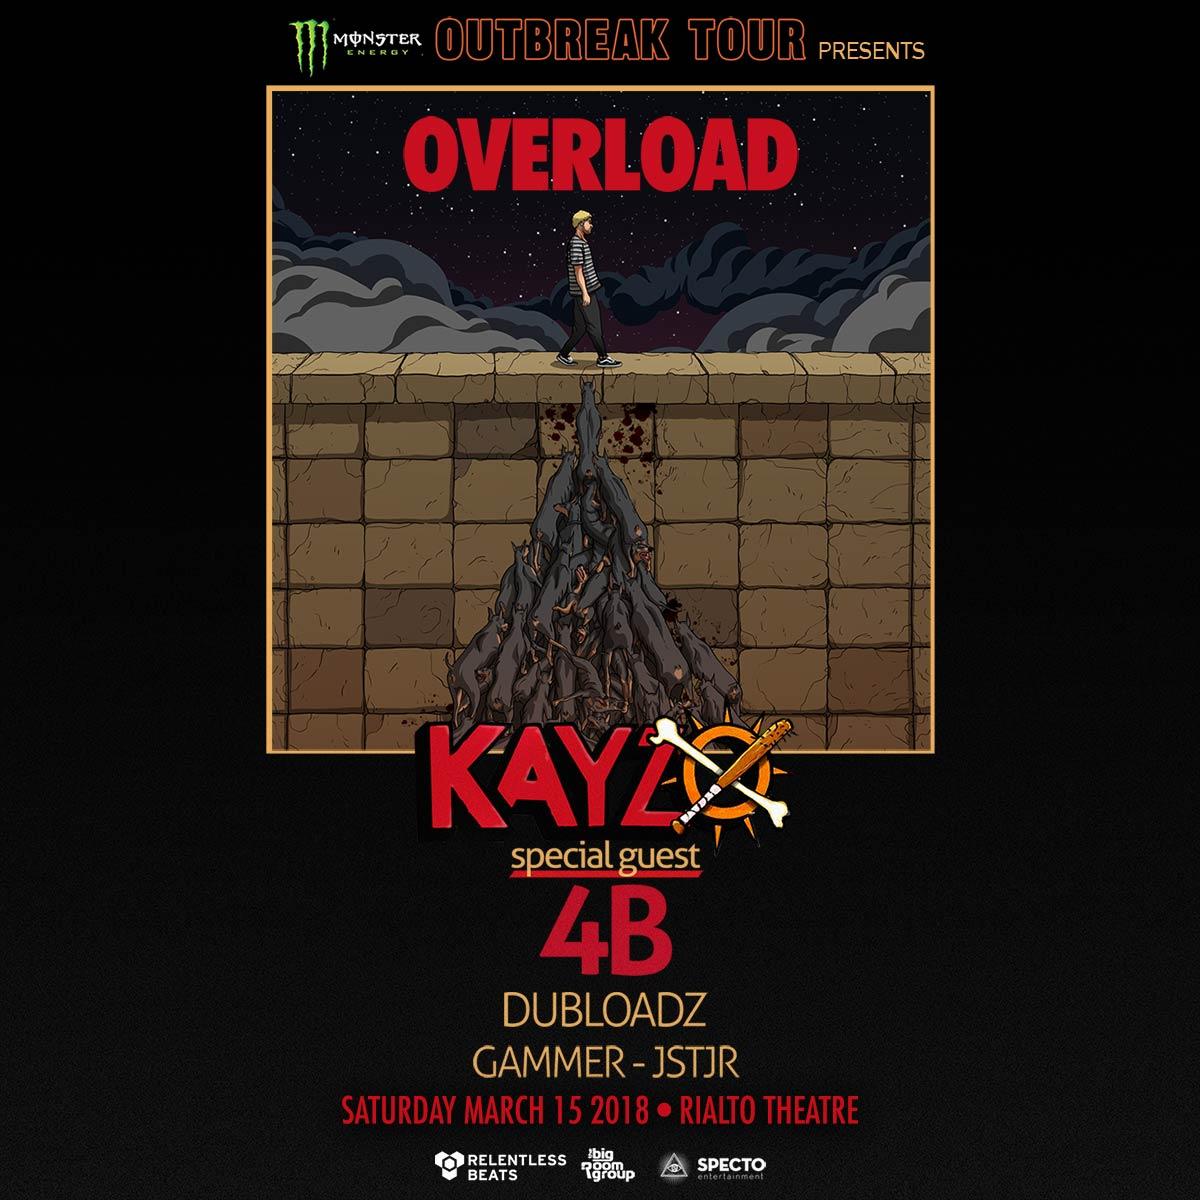 Flyer for Monster Outbreak Tour Presents: Kayzo - Overload Tour, Tucson